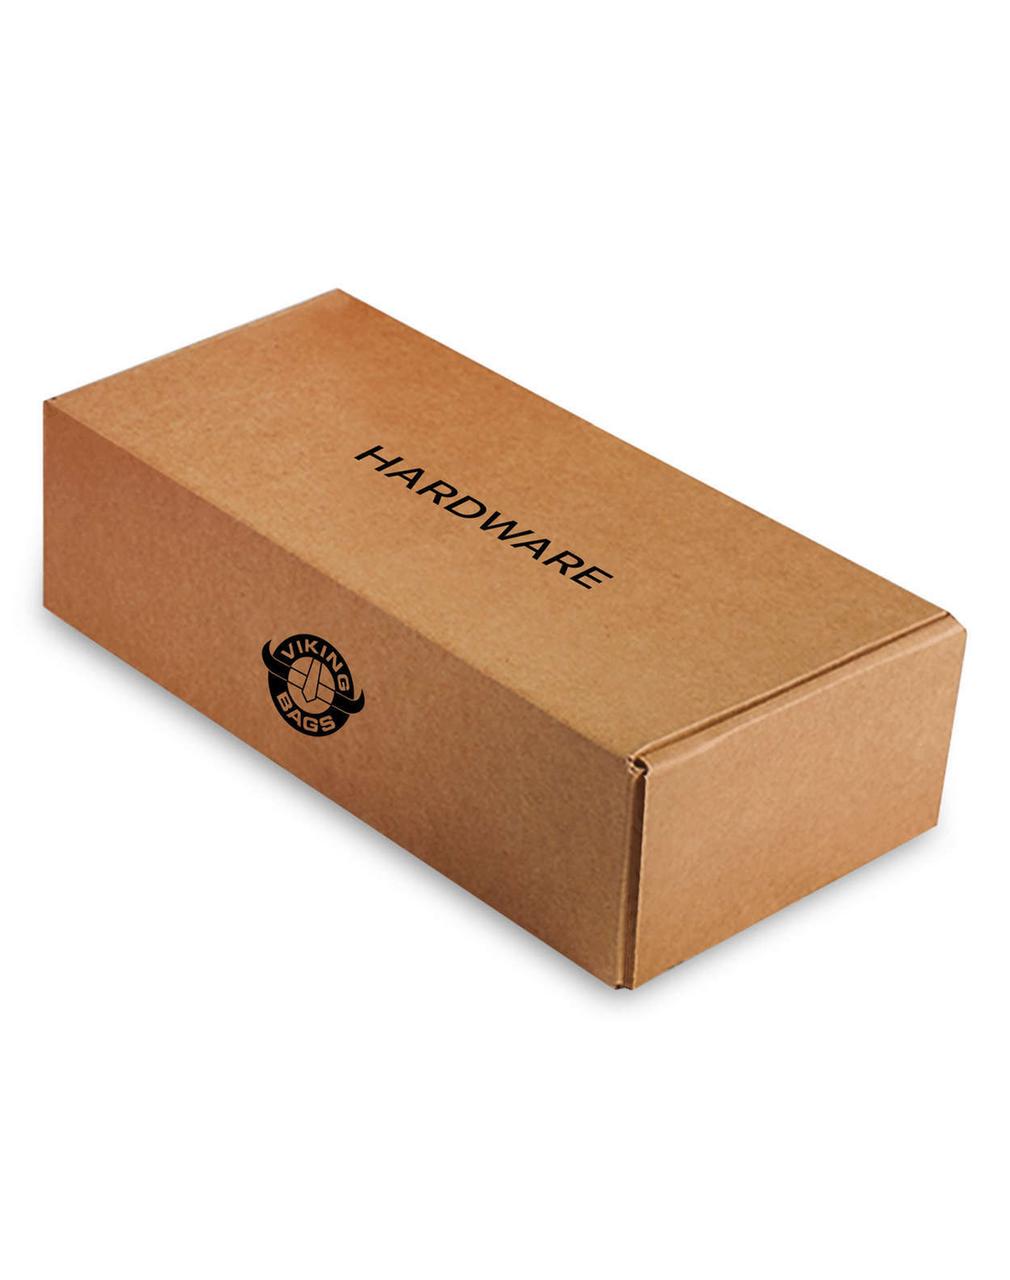 Honda 750 Shadow Phantom Charger Side Pocket With Shock Cutout Motorcycle Saddlebags box